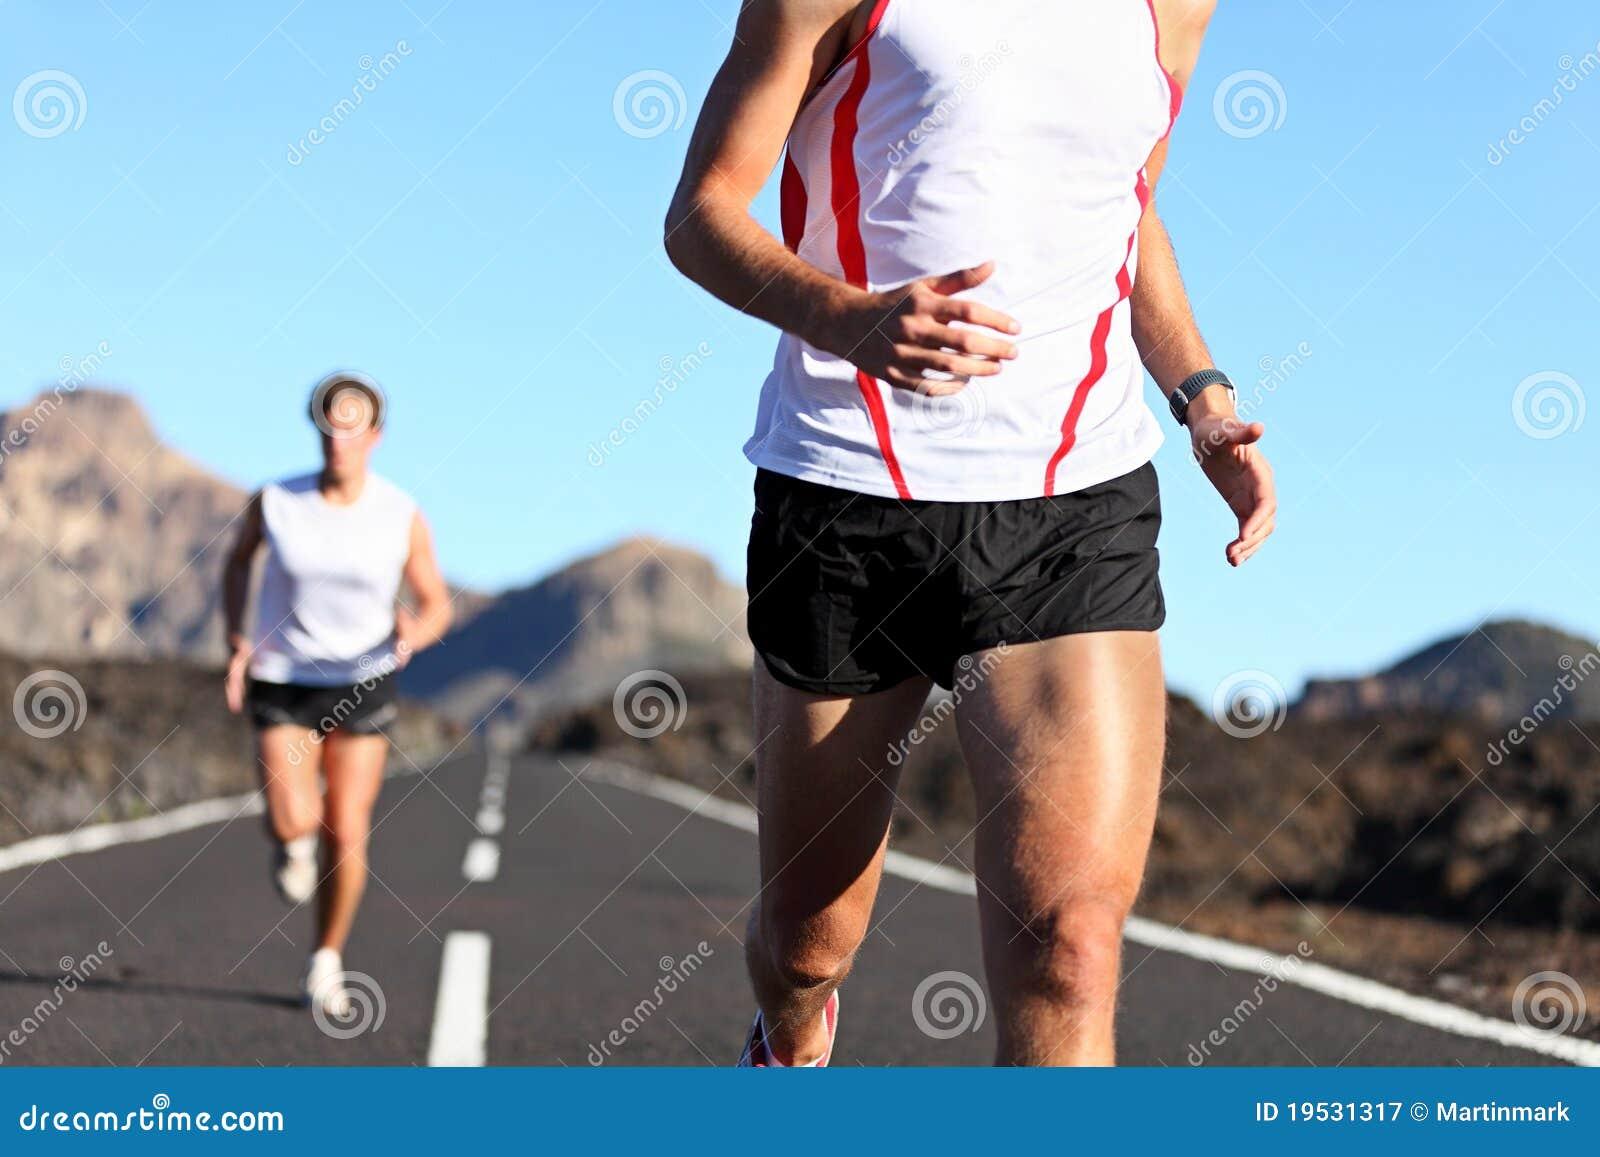 Esporte Running